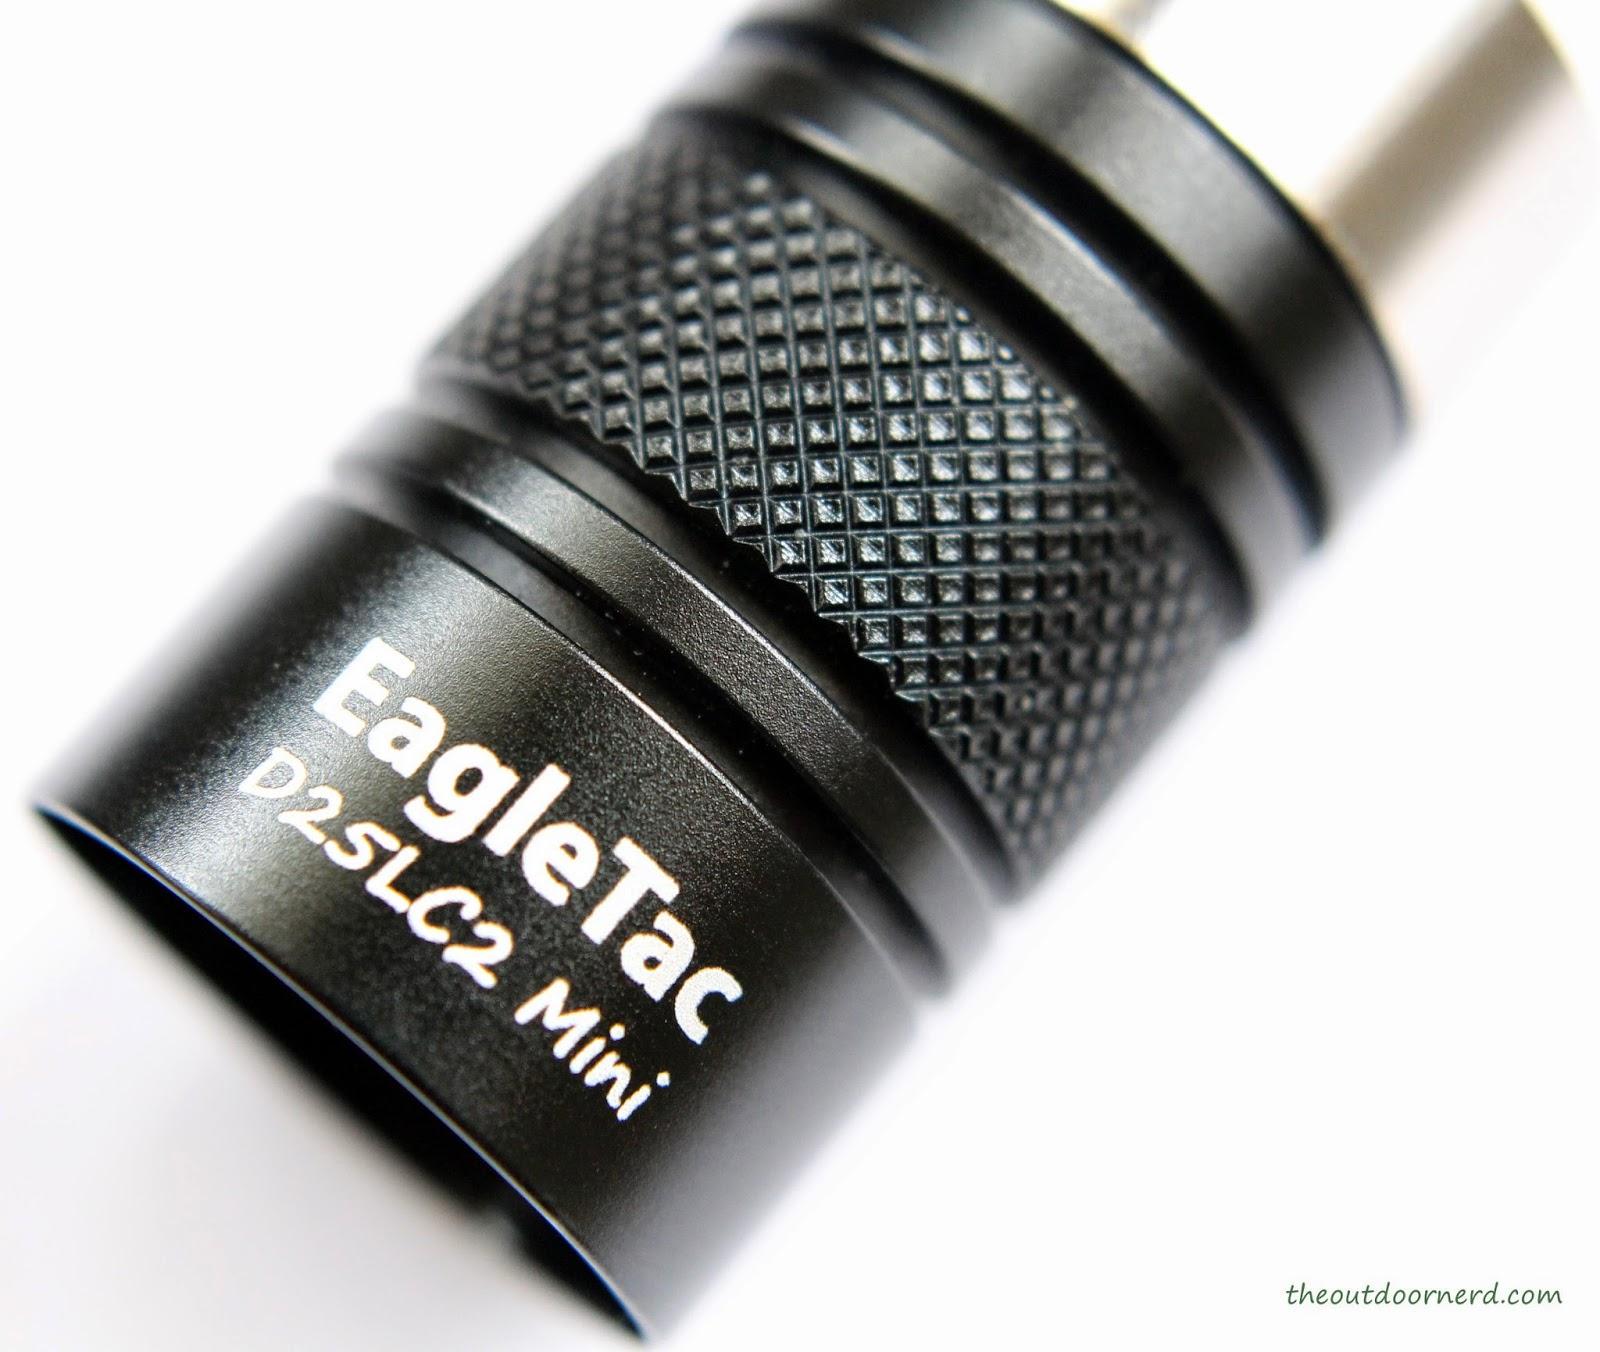 EagleTac D25LC2 Mini 18650 Flashlight Product Image 7